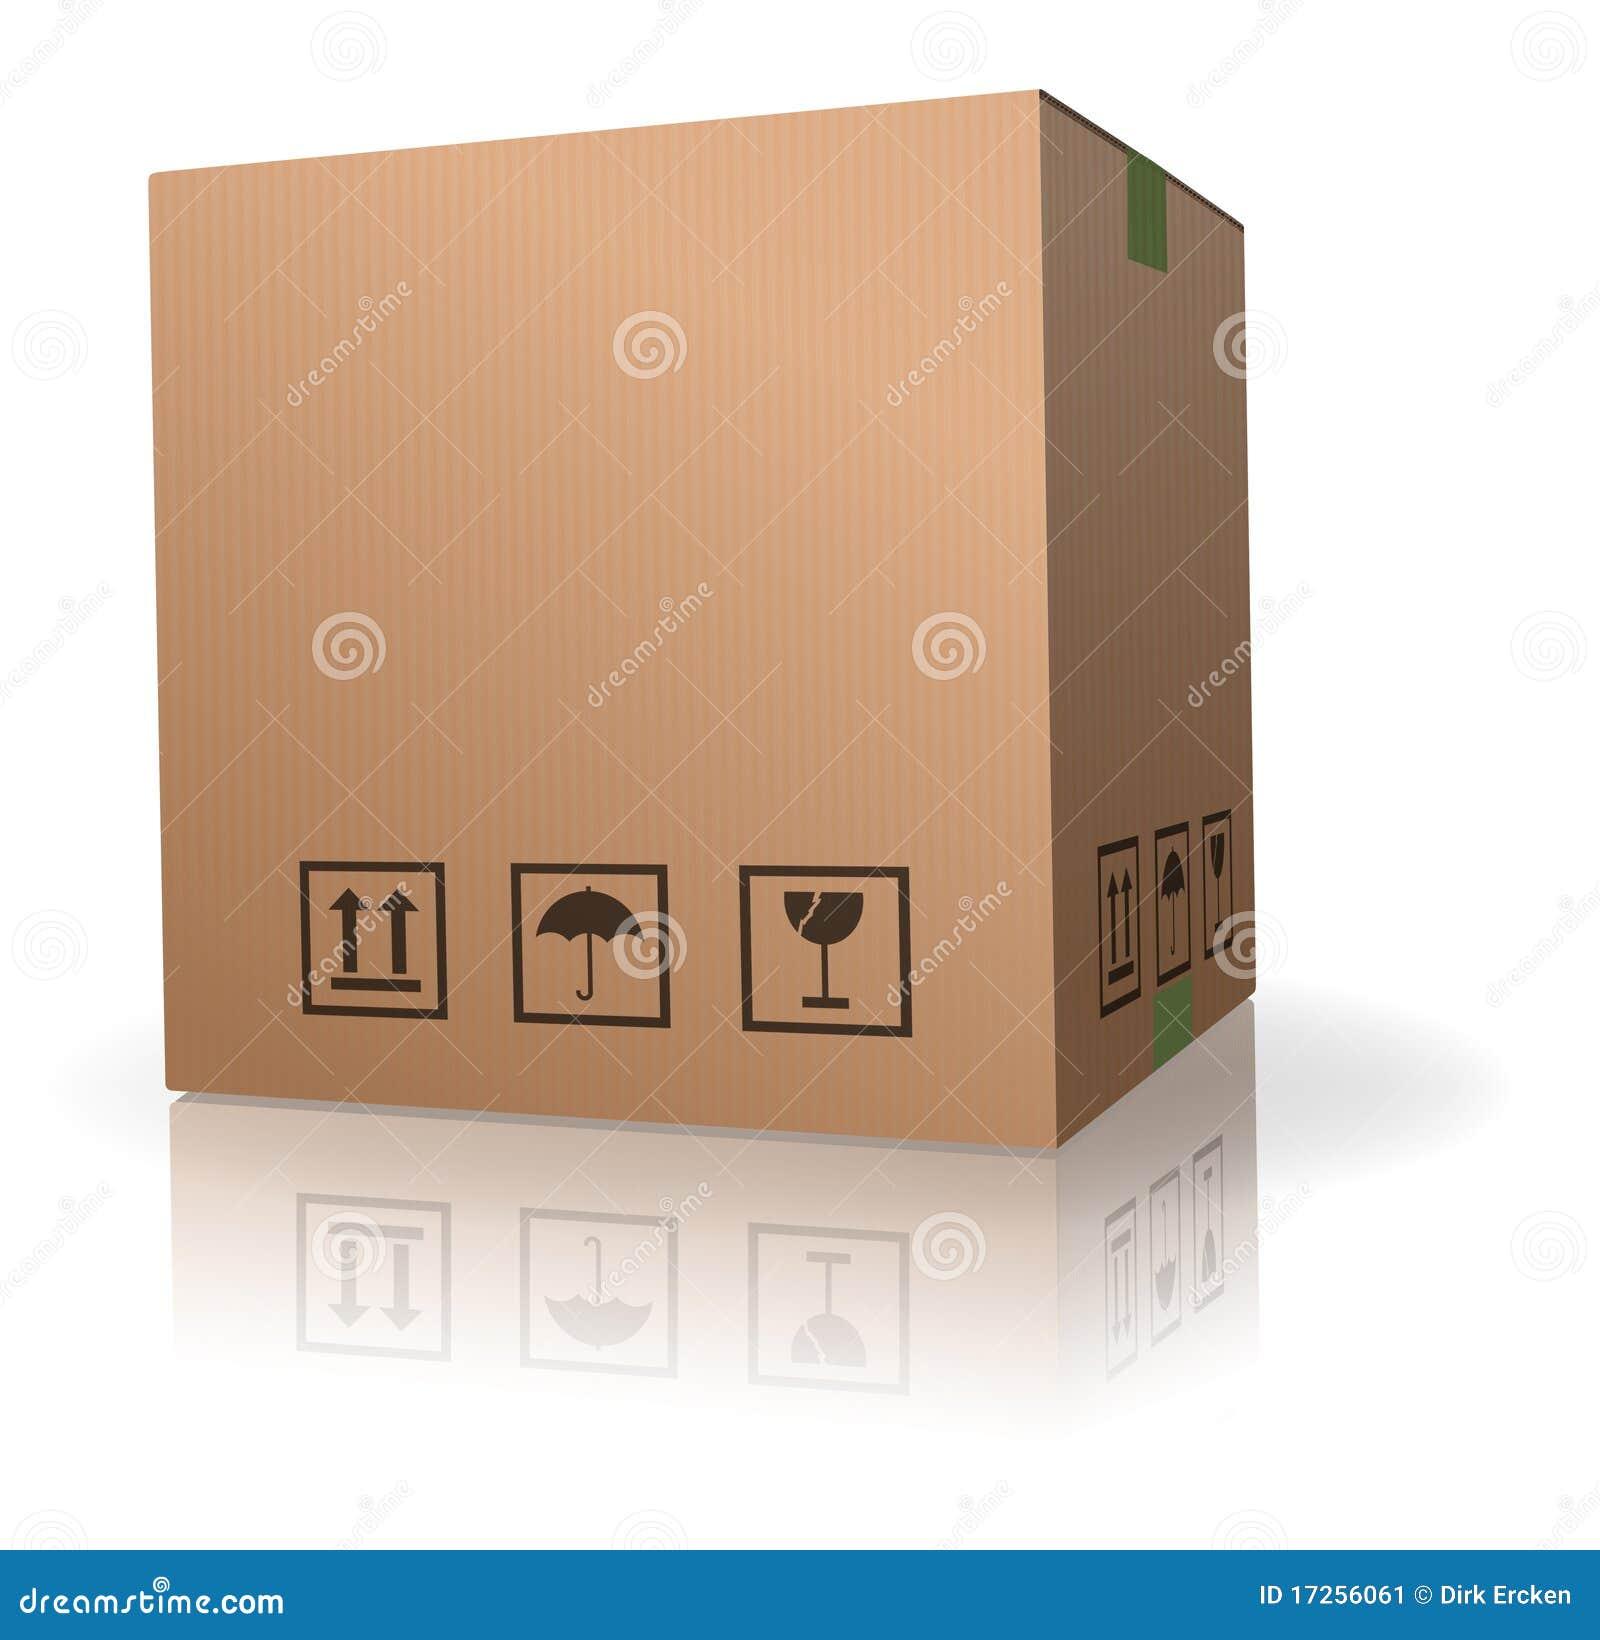 Caja de cart n del almacenaje de brown imagen de archivo for Cajas carton almacenaje